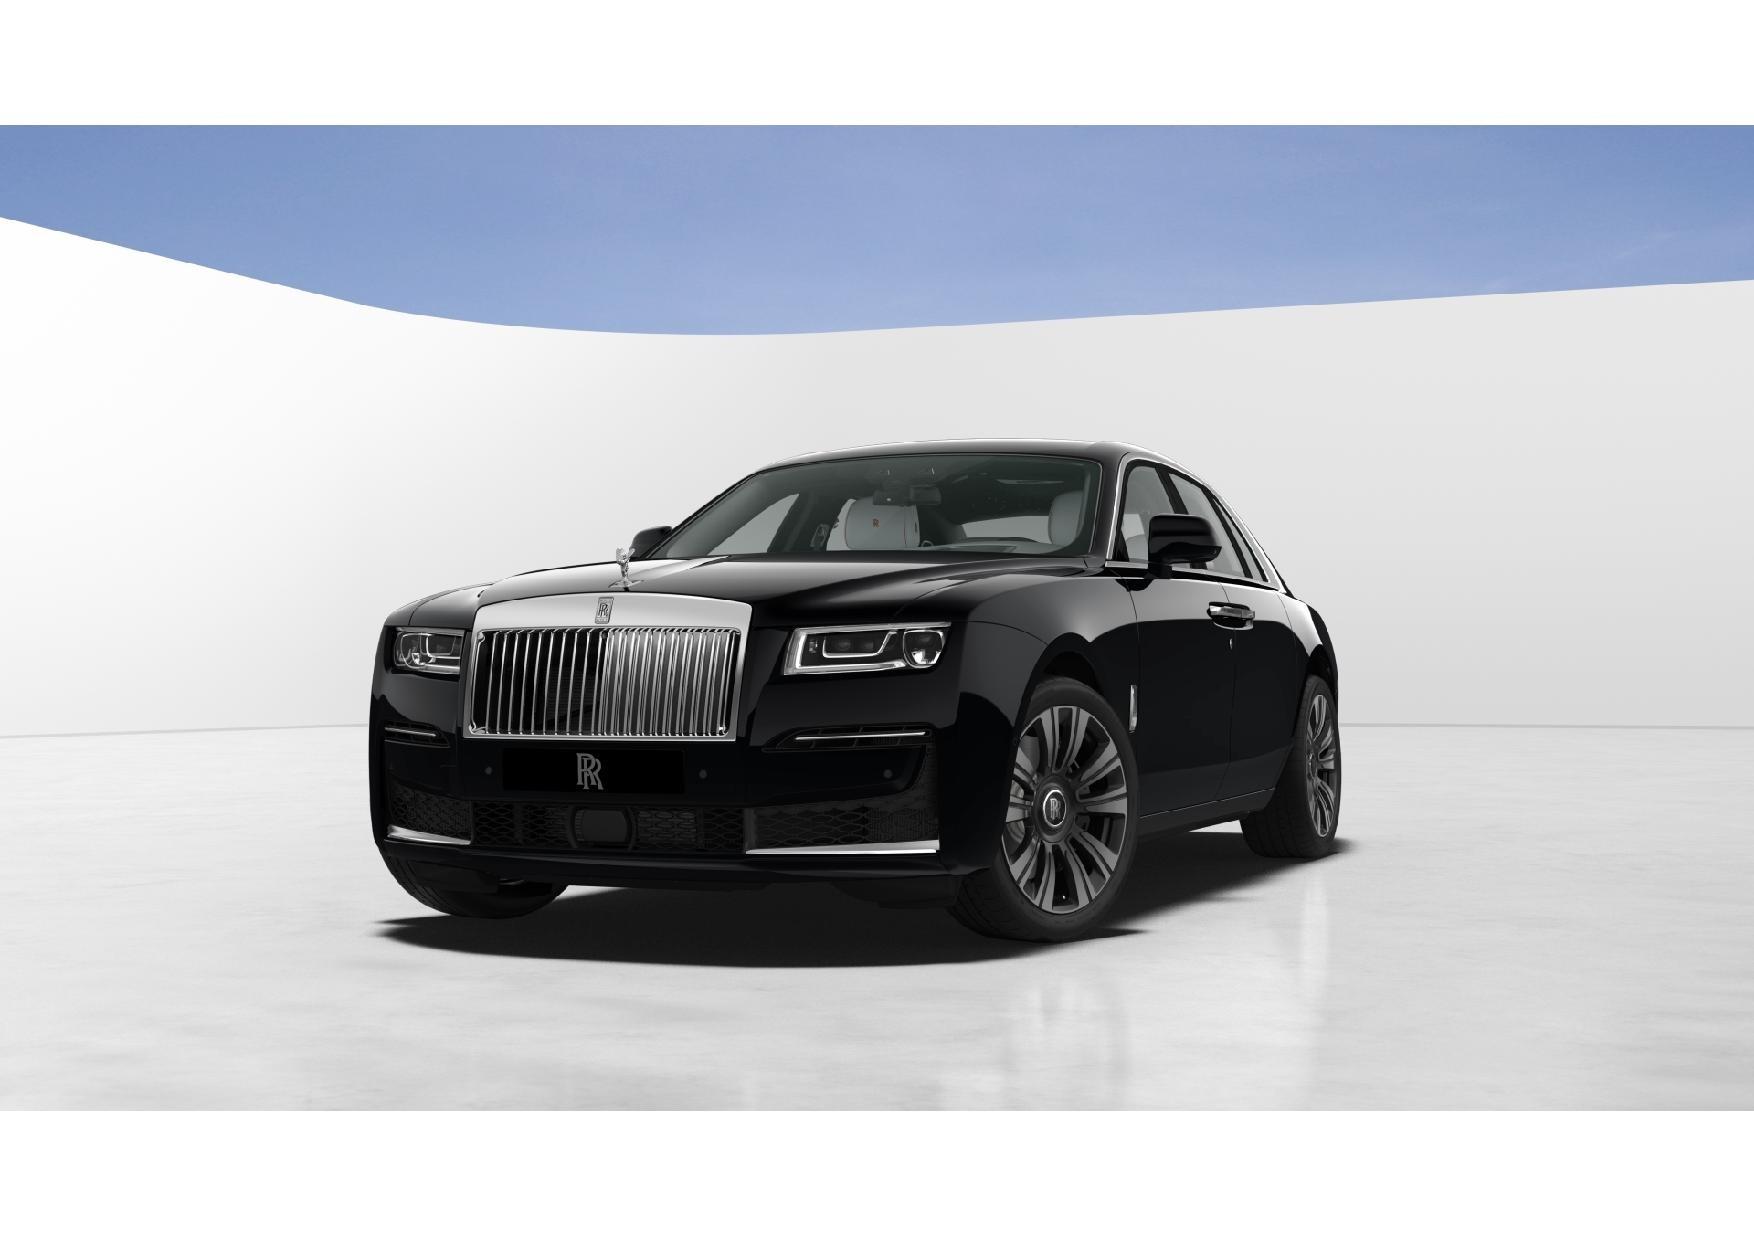 New 2021 Rolls-Royce Ghost for sale $378,350 at Rolls-Royce Motor Cars Greenwich in Greenwich CT 06830 1